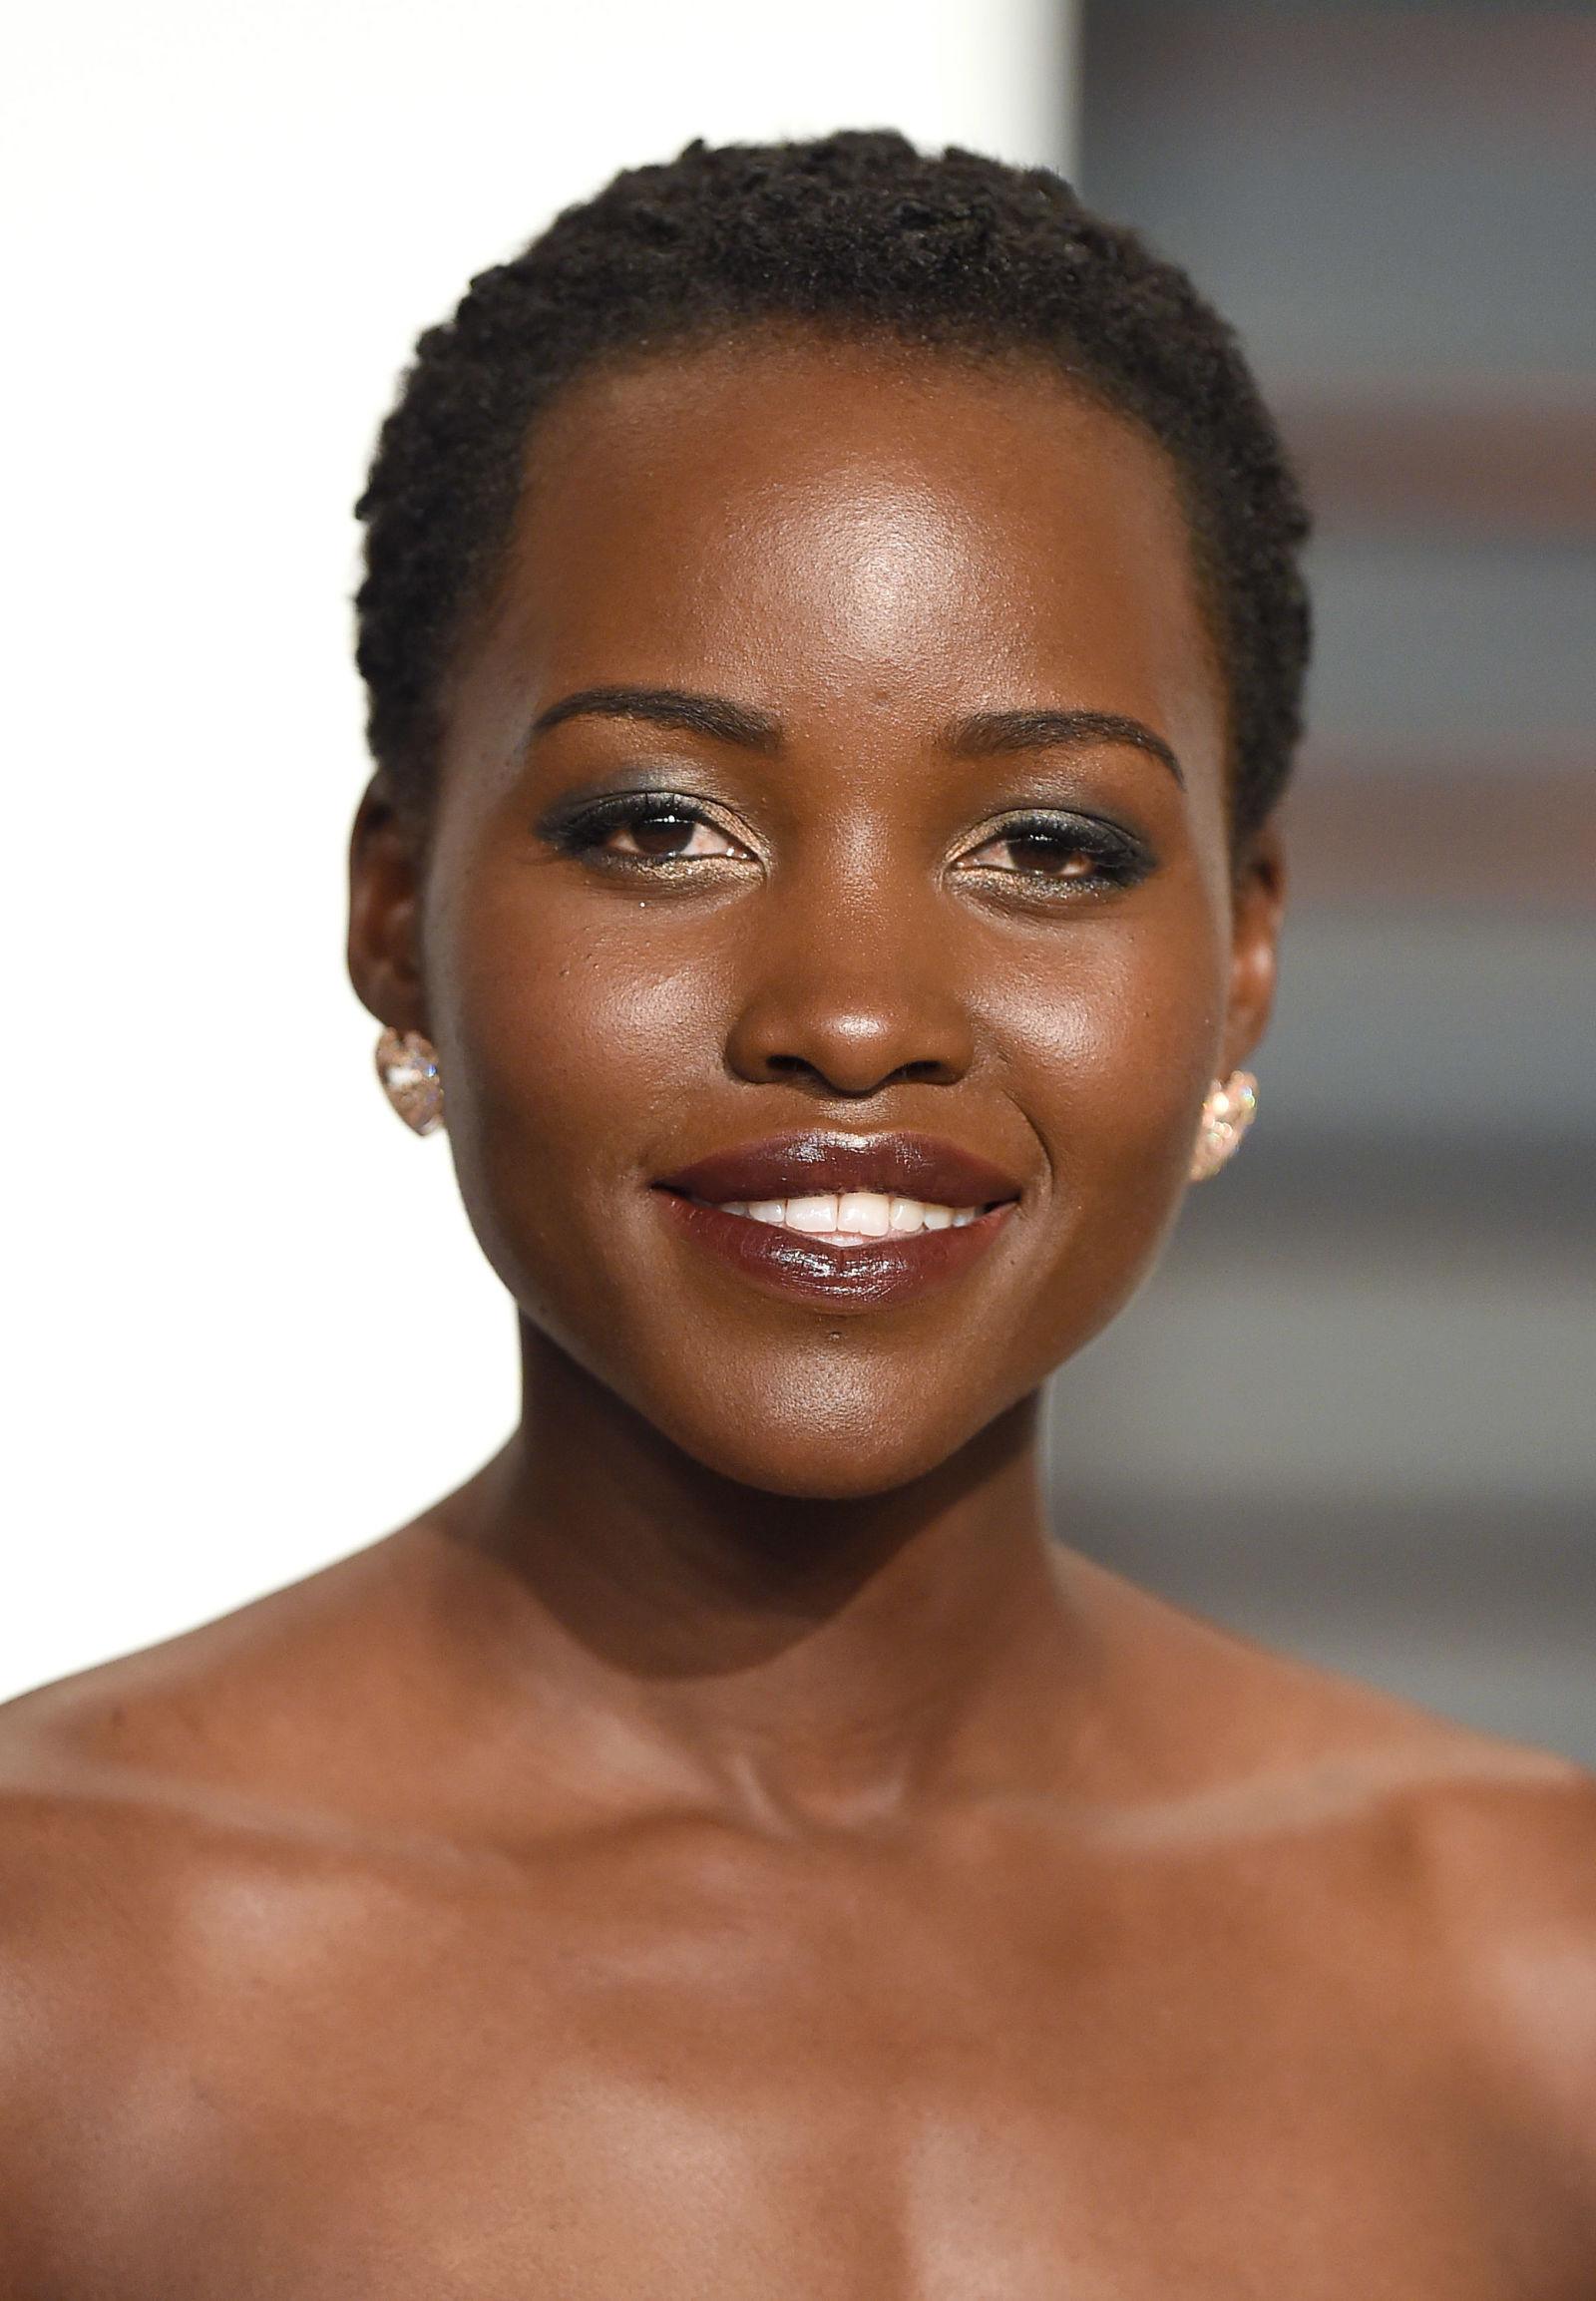 Sensational Jazzy Black Women Short Hairstyles 2016 Hairstyles 2016 Hair Hairstyles For Men Maxibearus